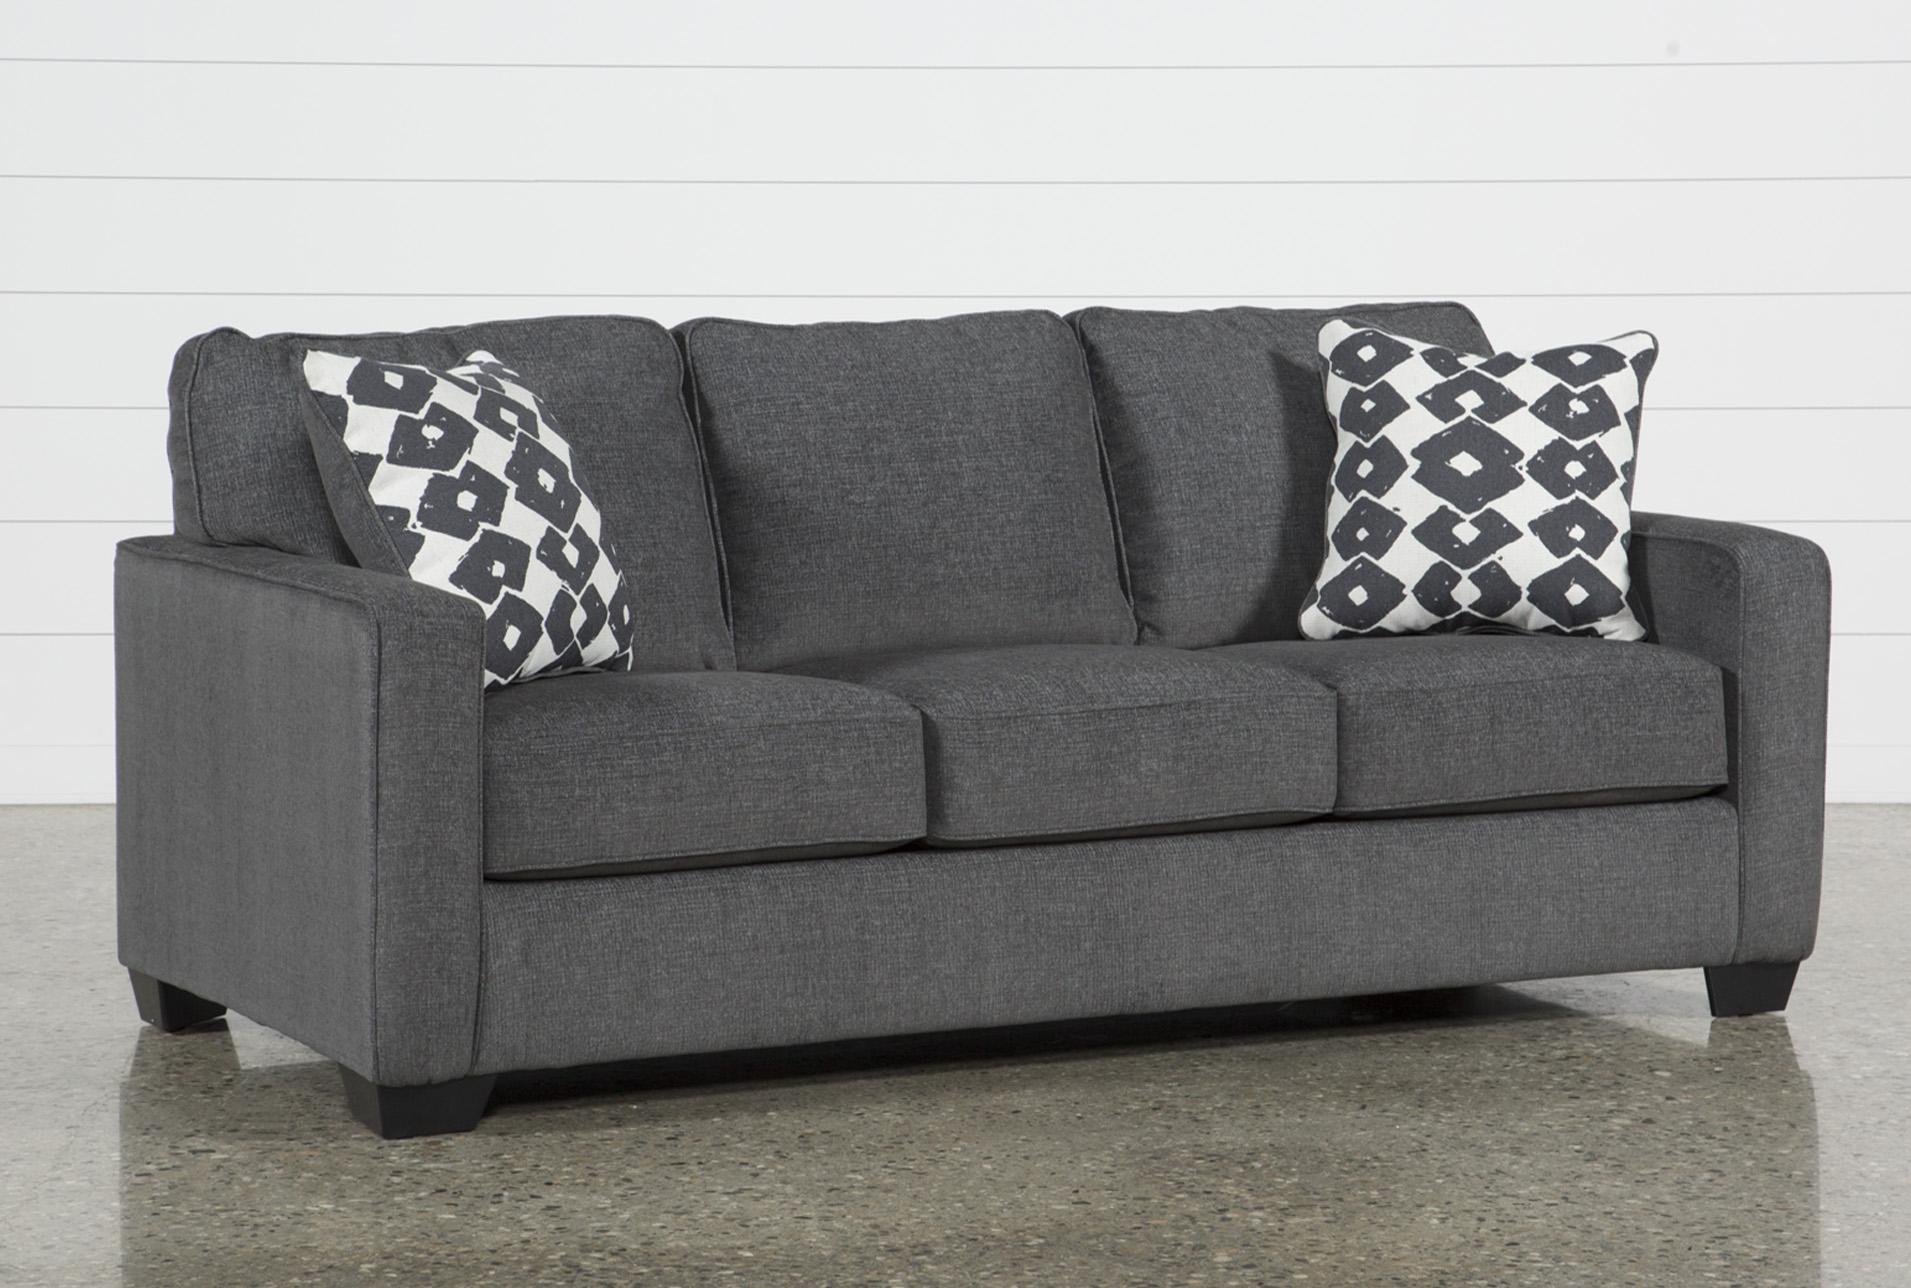 turdur queen sofa sleeper living spaces rh livingspaces com queen sofa beds for sale queen sofa